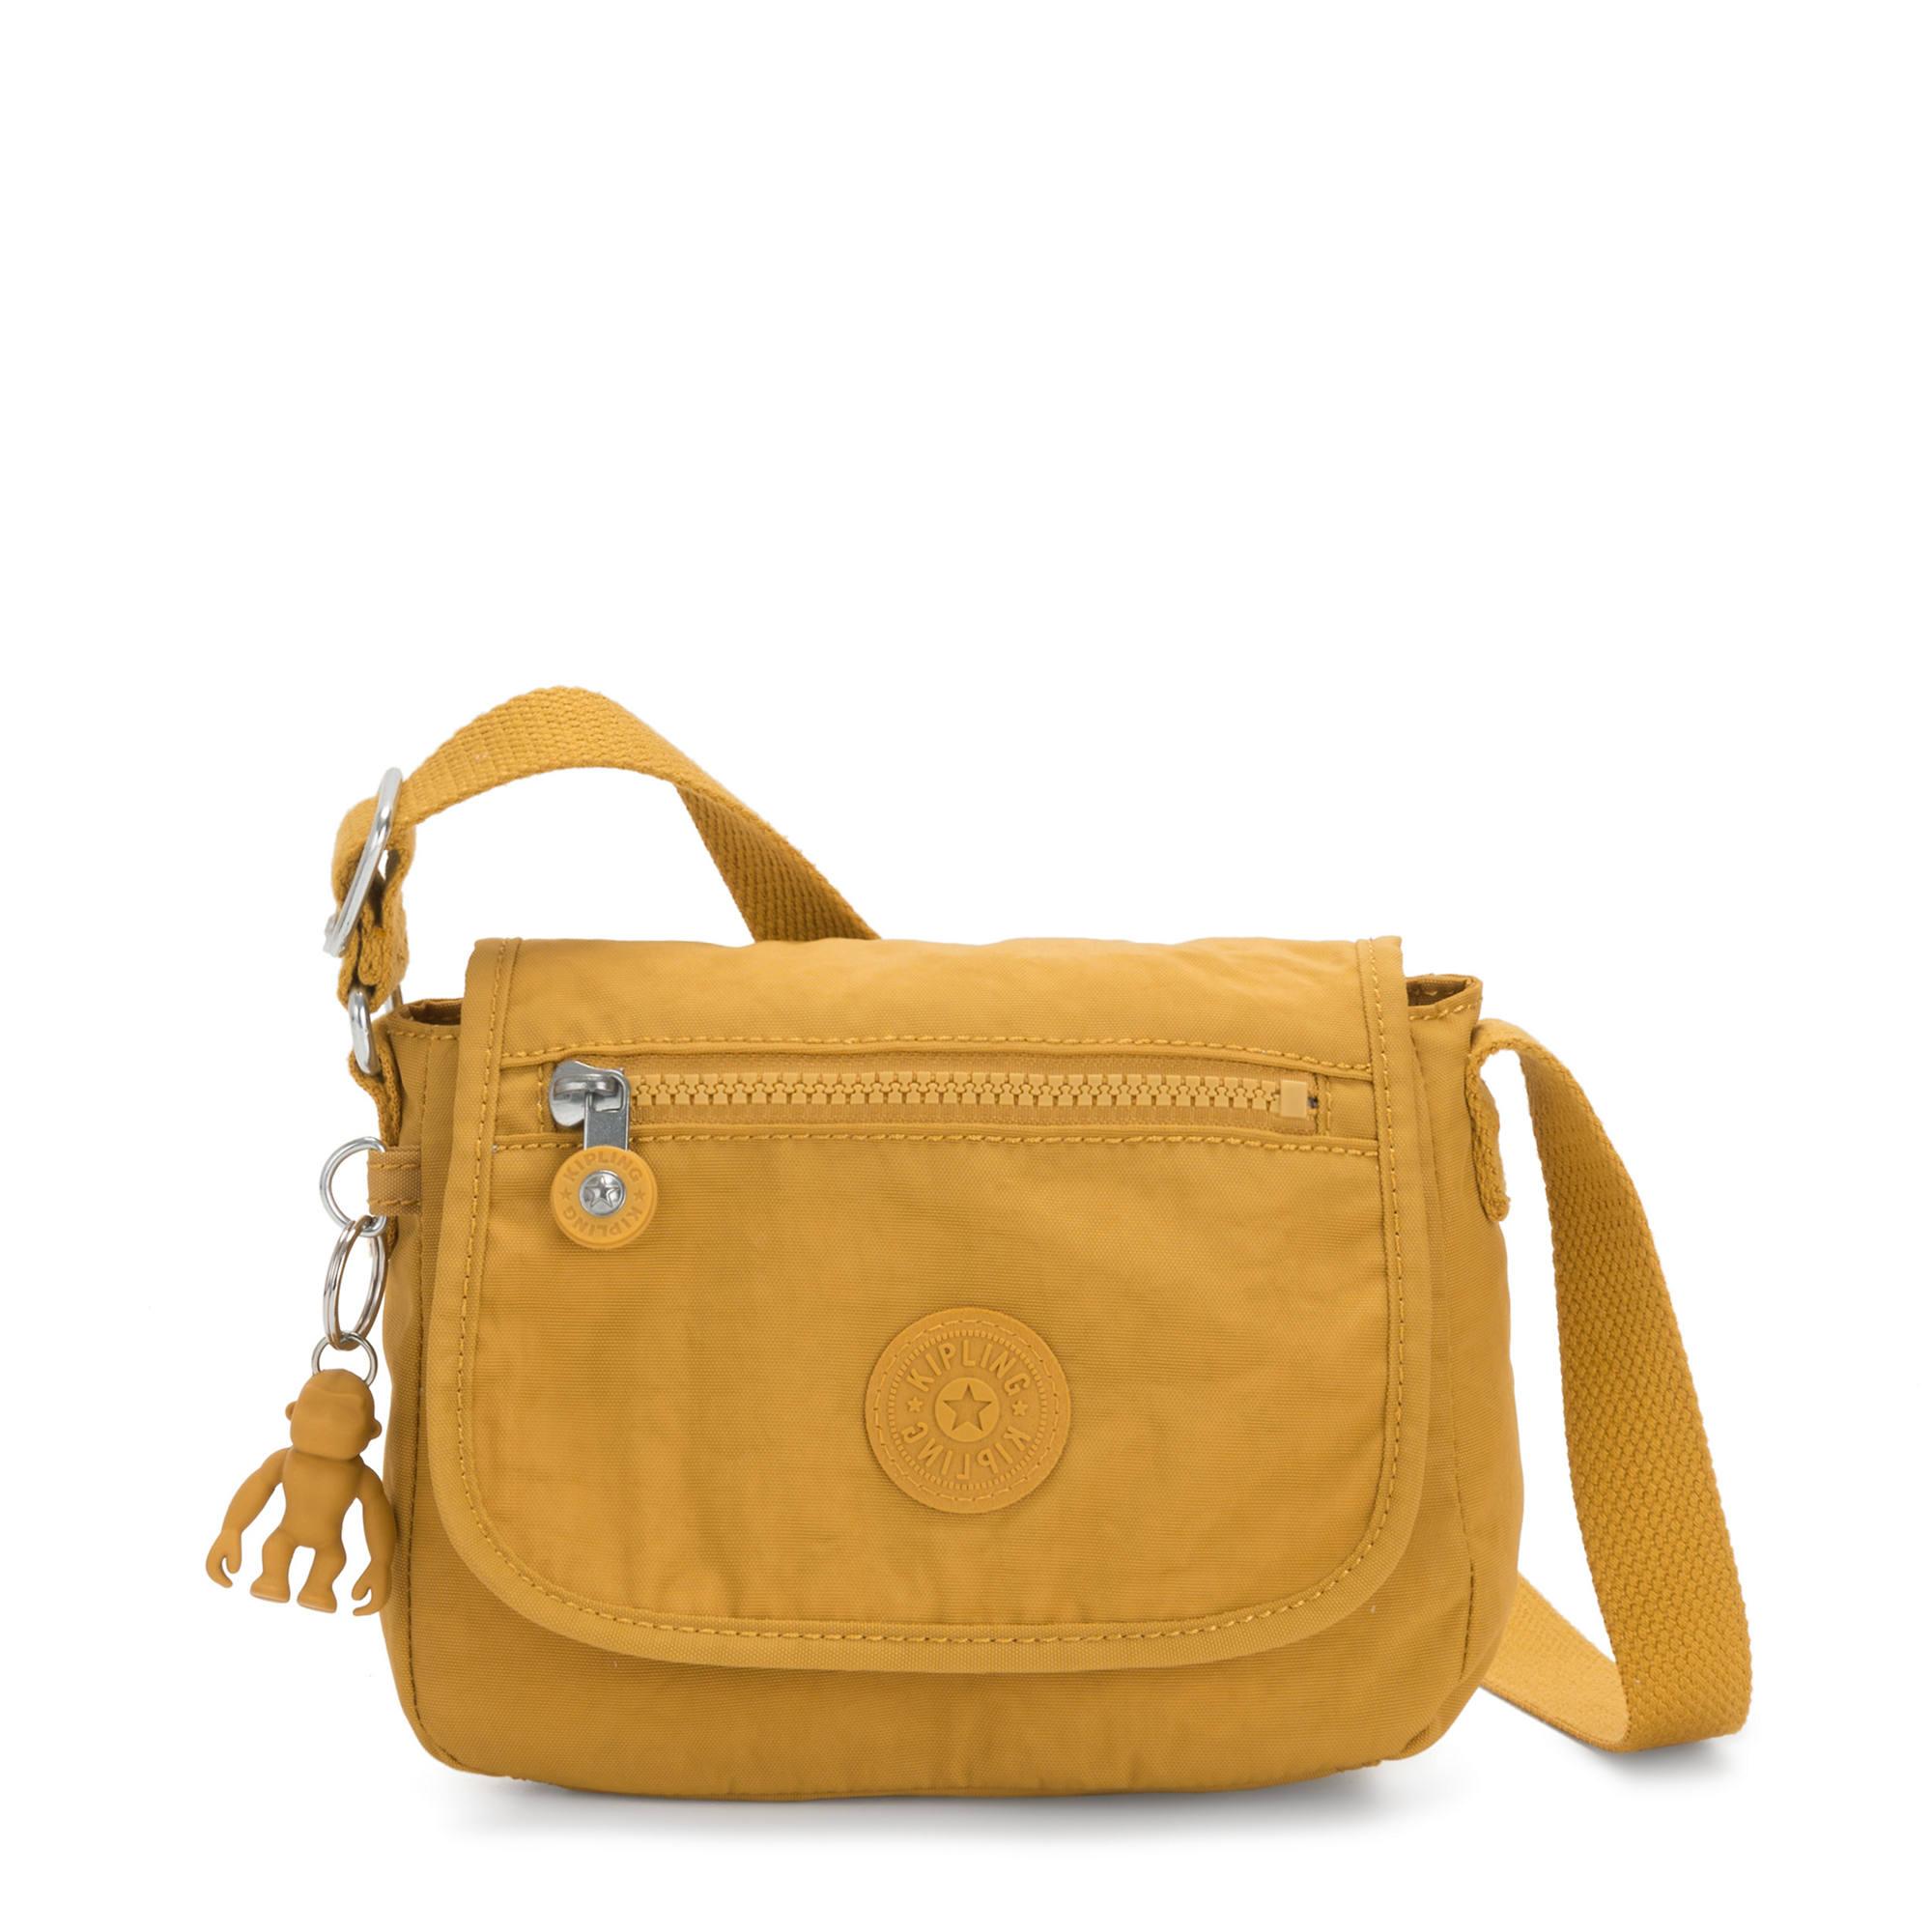 b758fe85e6f3 Sabian Crossbody Mini Bag